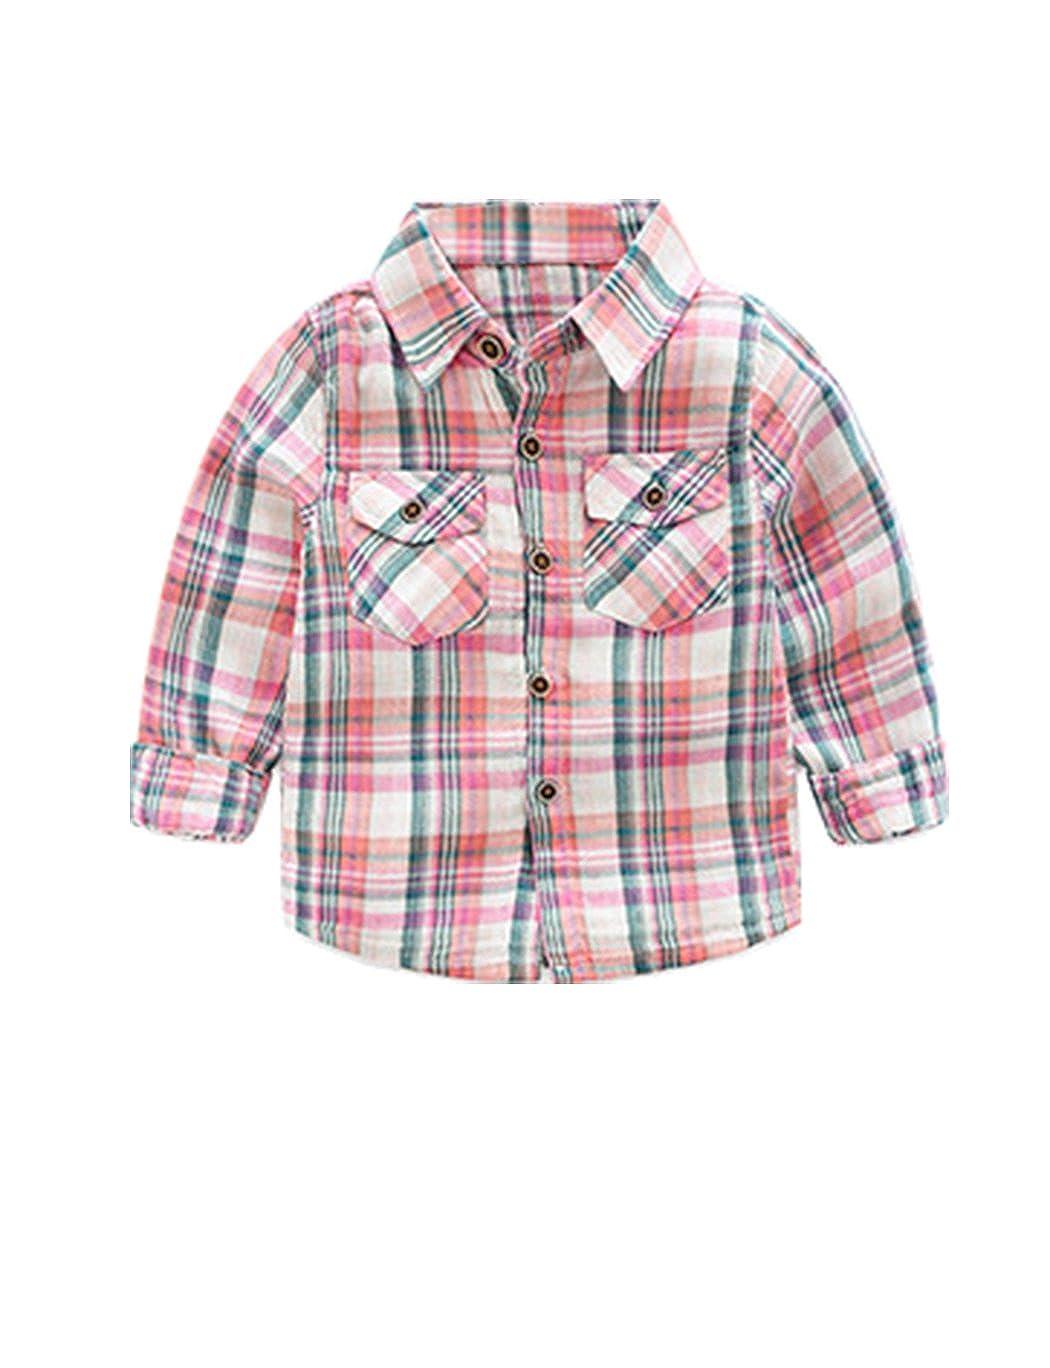 Five Colors DDSOL Kids Long Sleeve Boys Girls Plaid Cotton Shirt 2-7Years